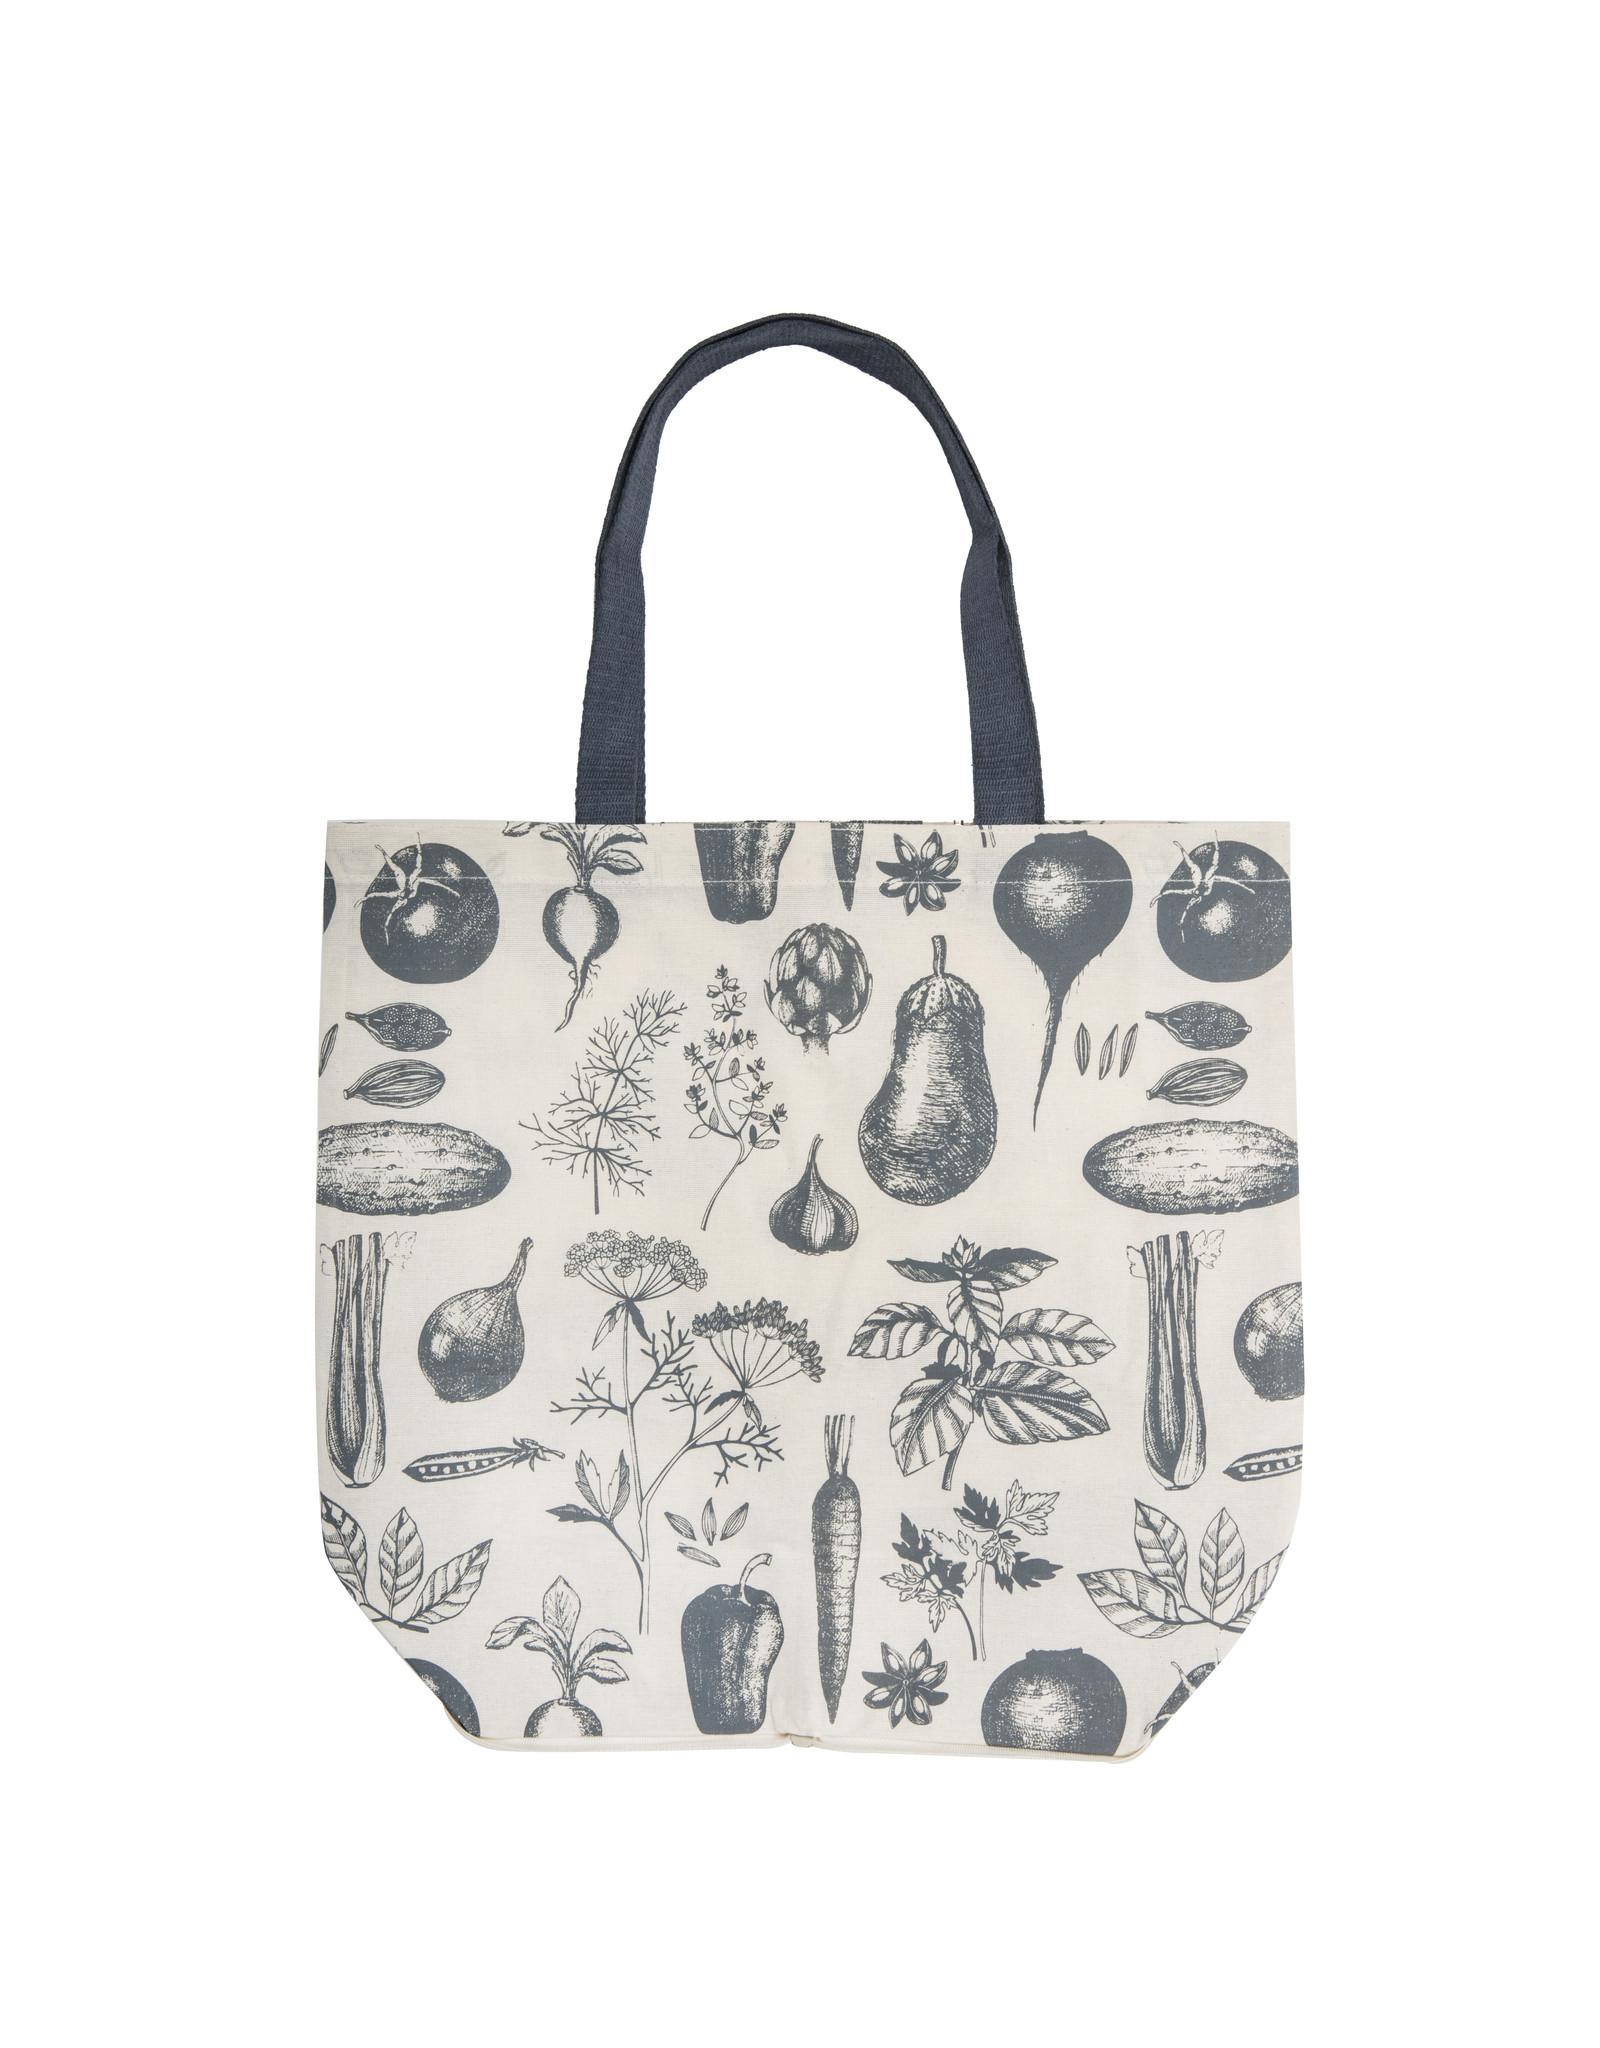 Stephanie Alexander Foldable Market Tote Bag